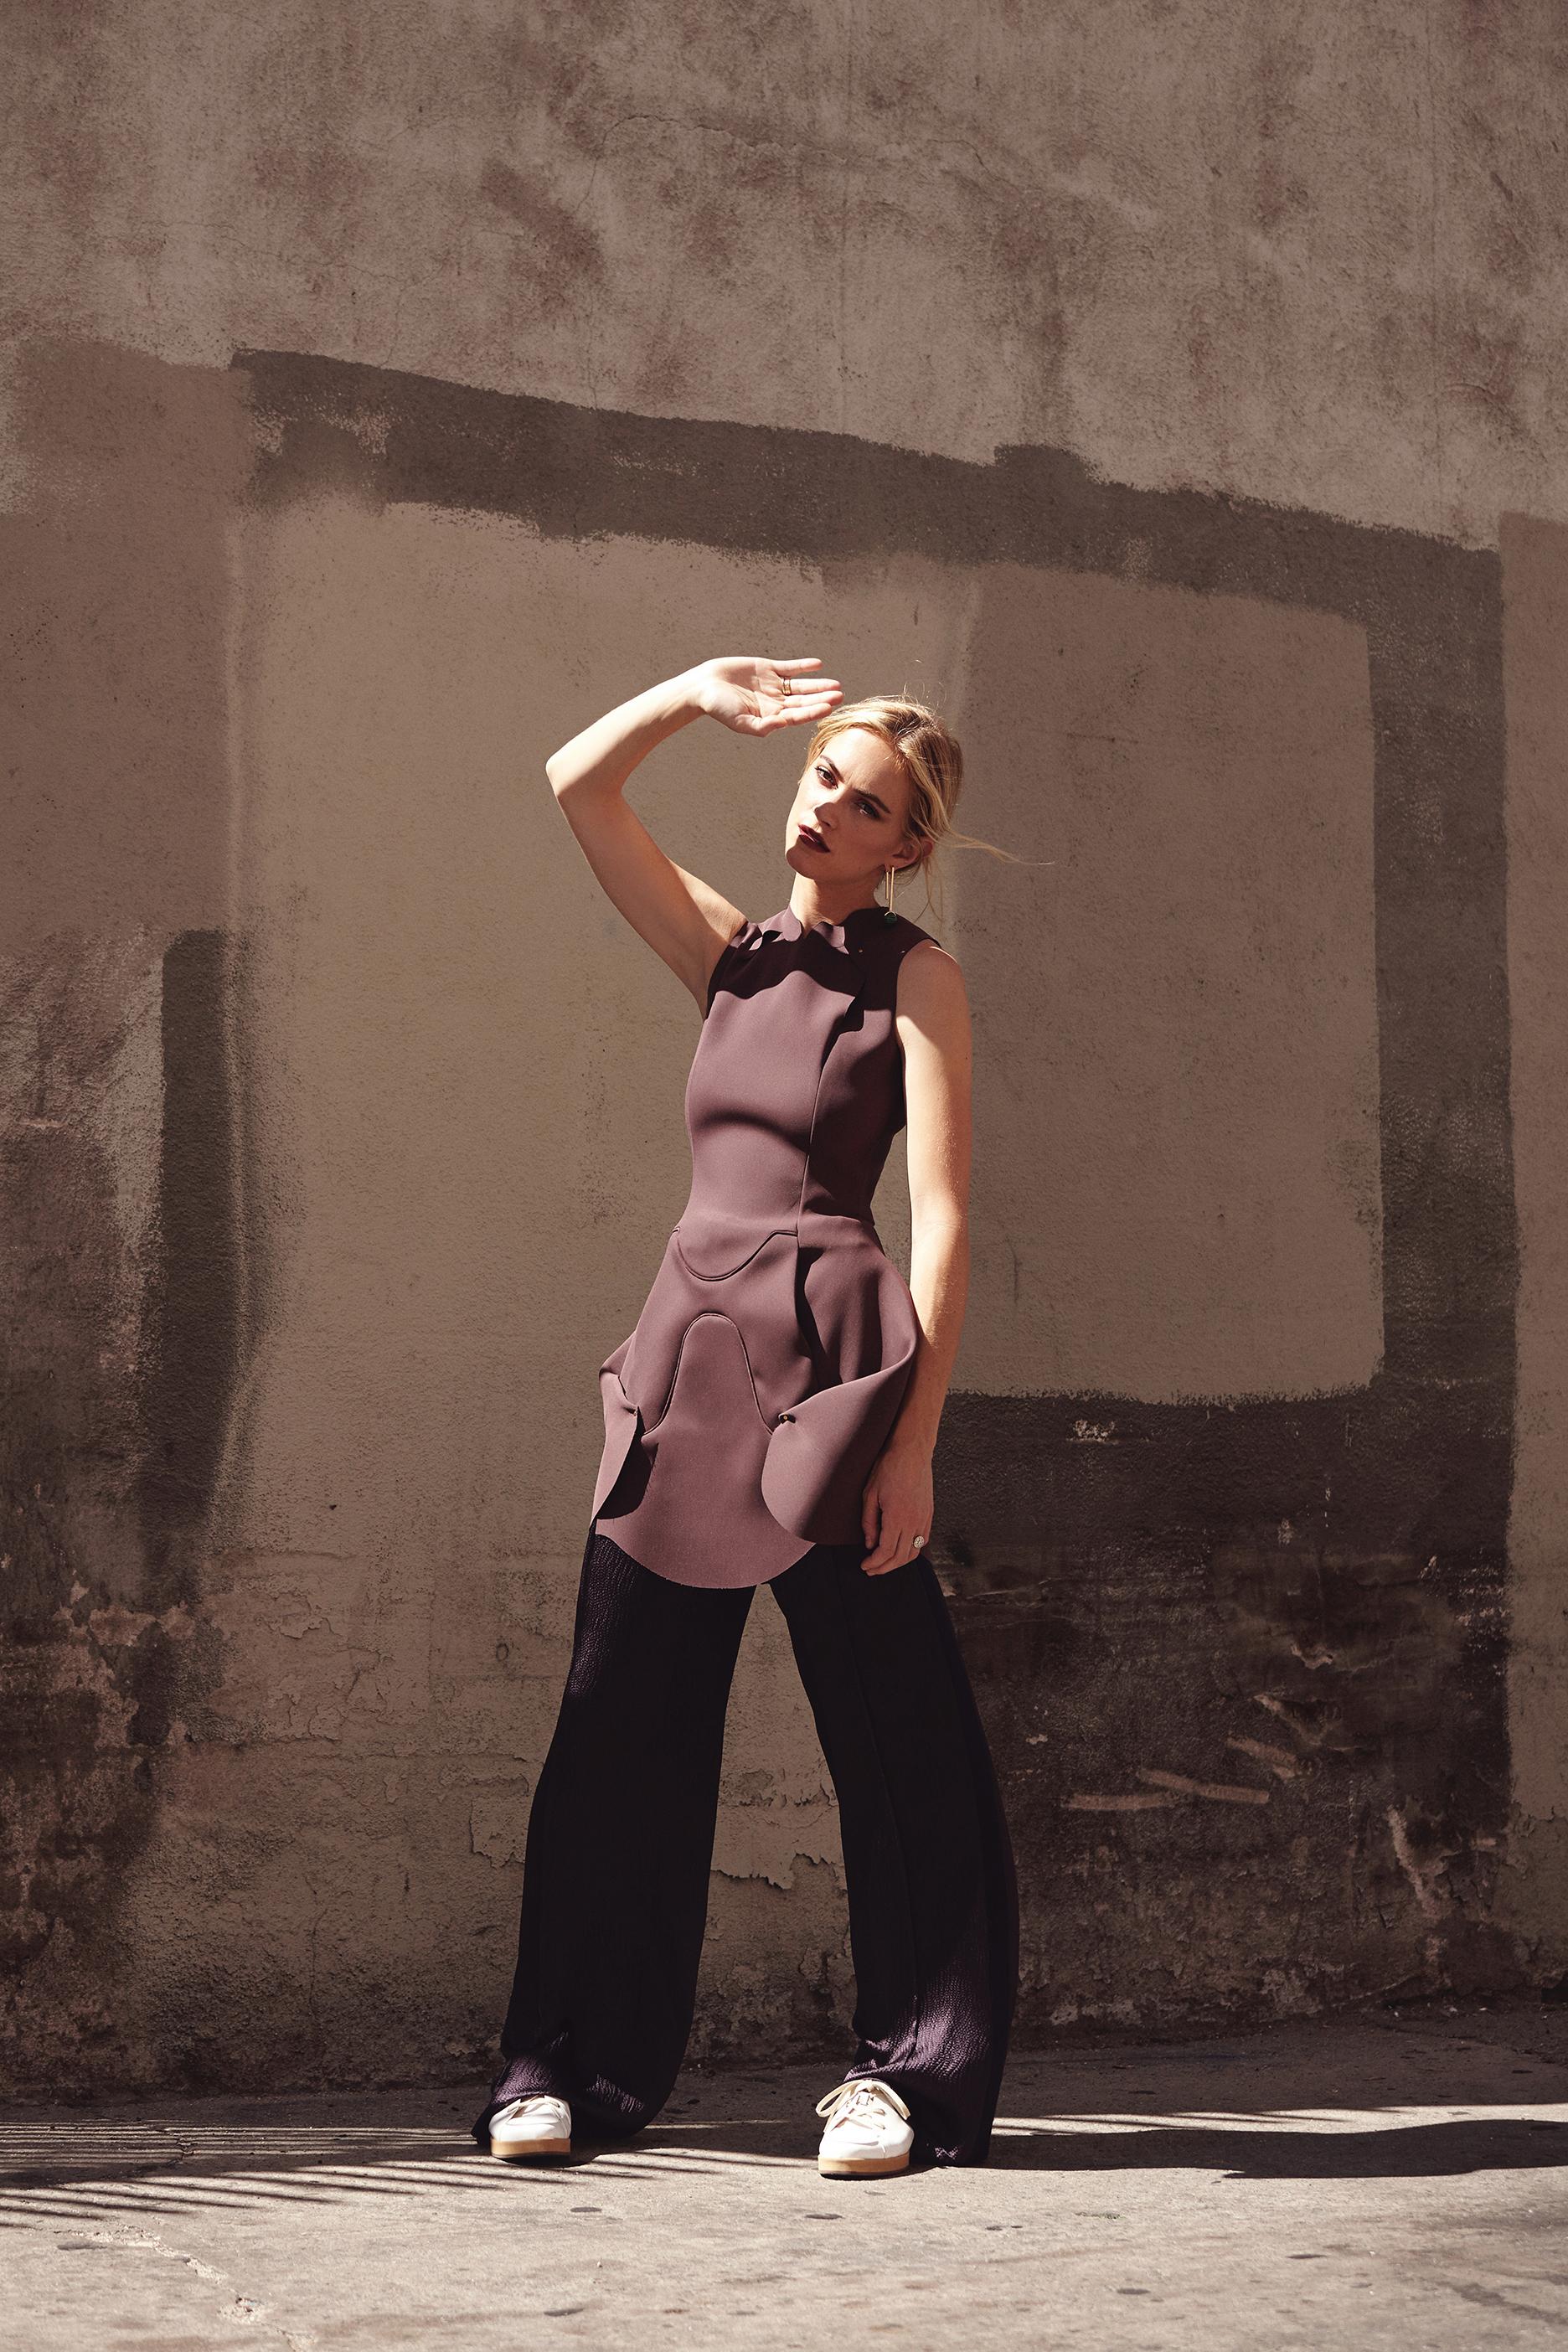 Dress by   ESTEBAN CORTAZAR  , Pants & shoes by   MAIYET  , Earrings by   ZARA  , Ring by   CARTIER  .